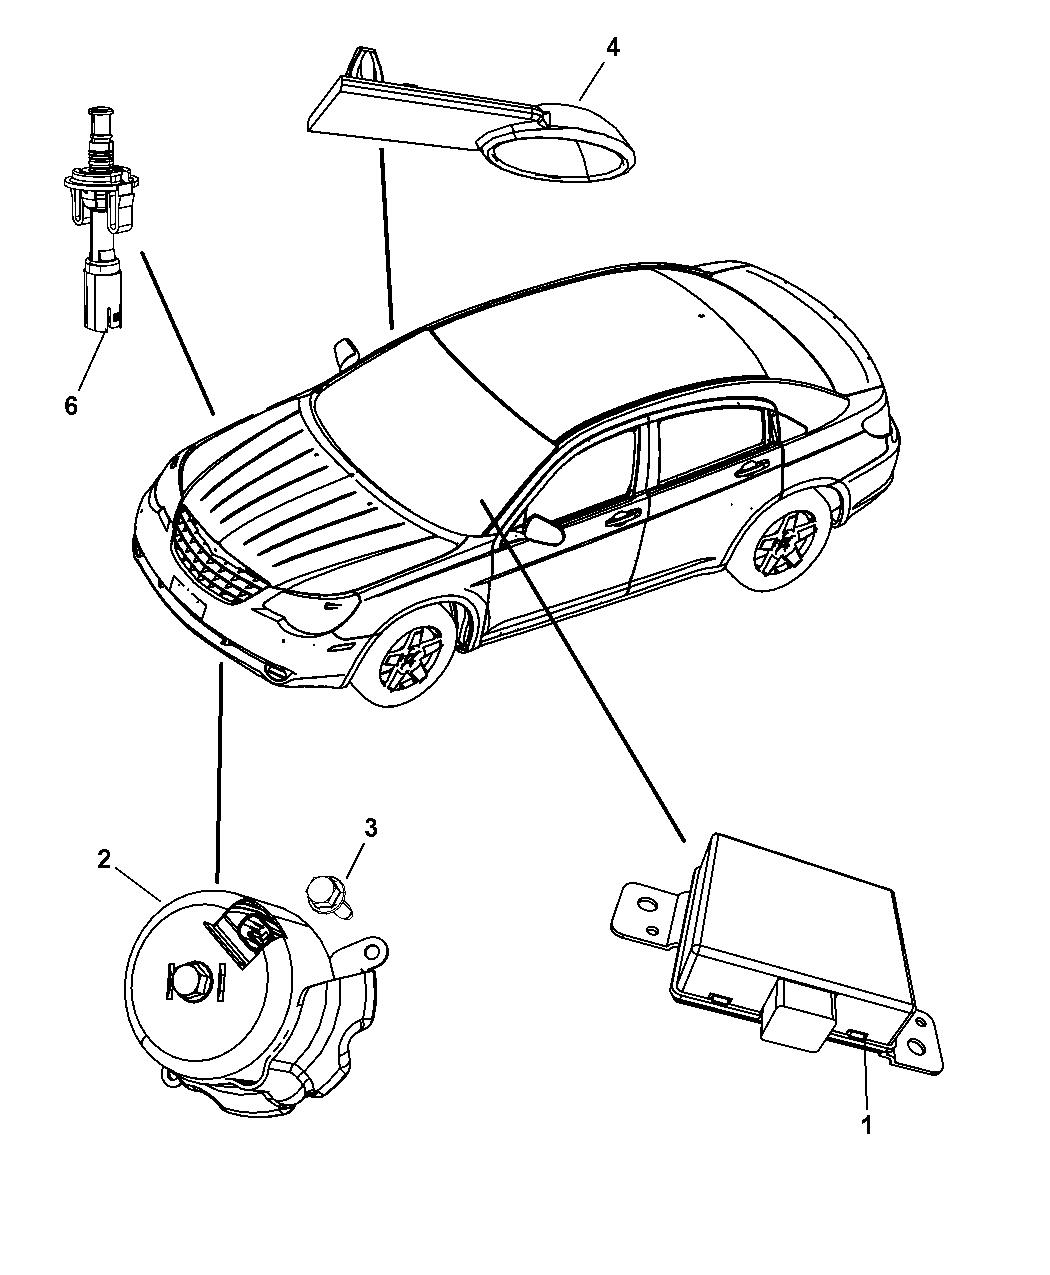 Chrysler Sebring Alarm System